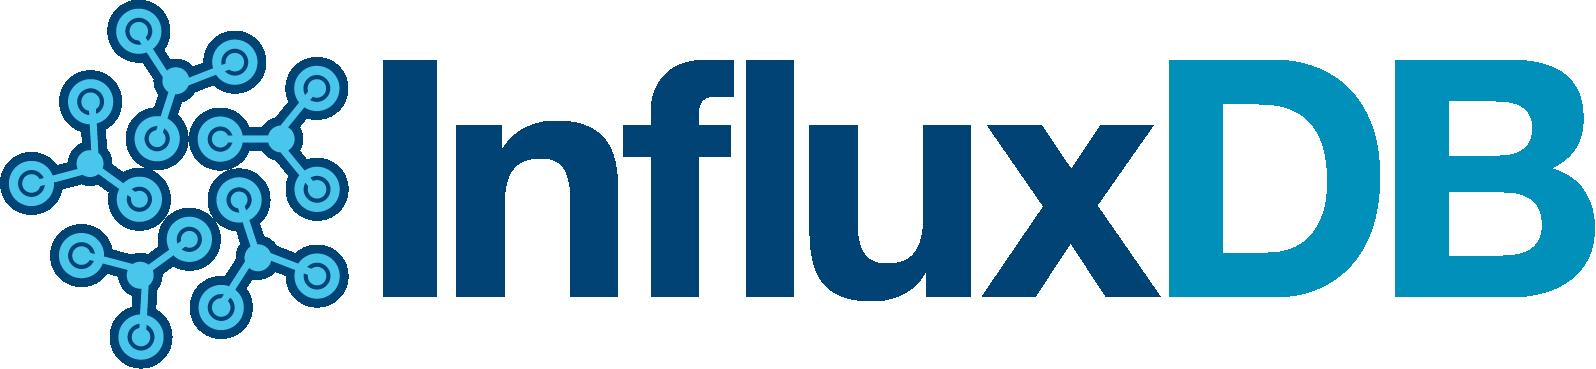 influxdb_flat_logo